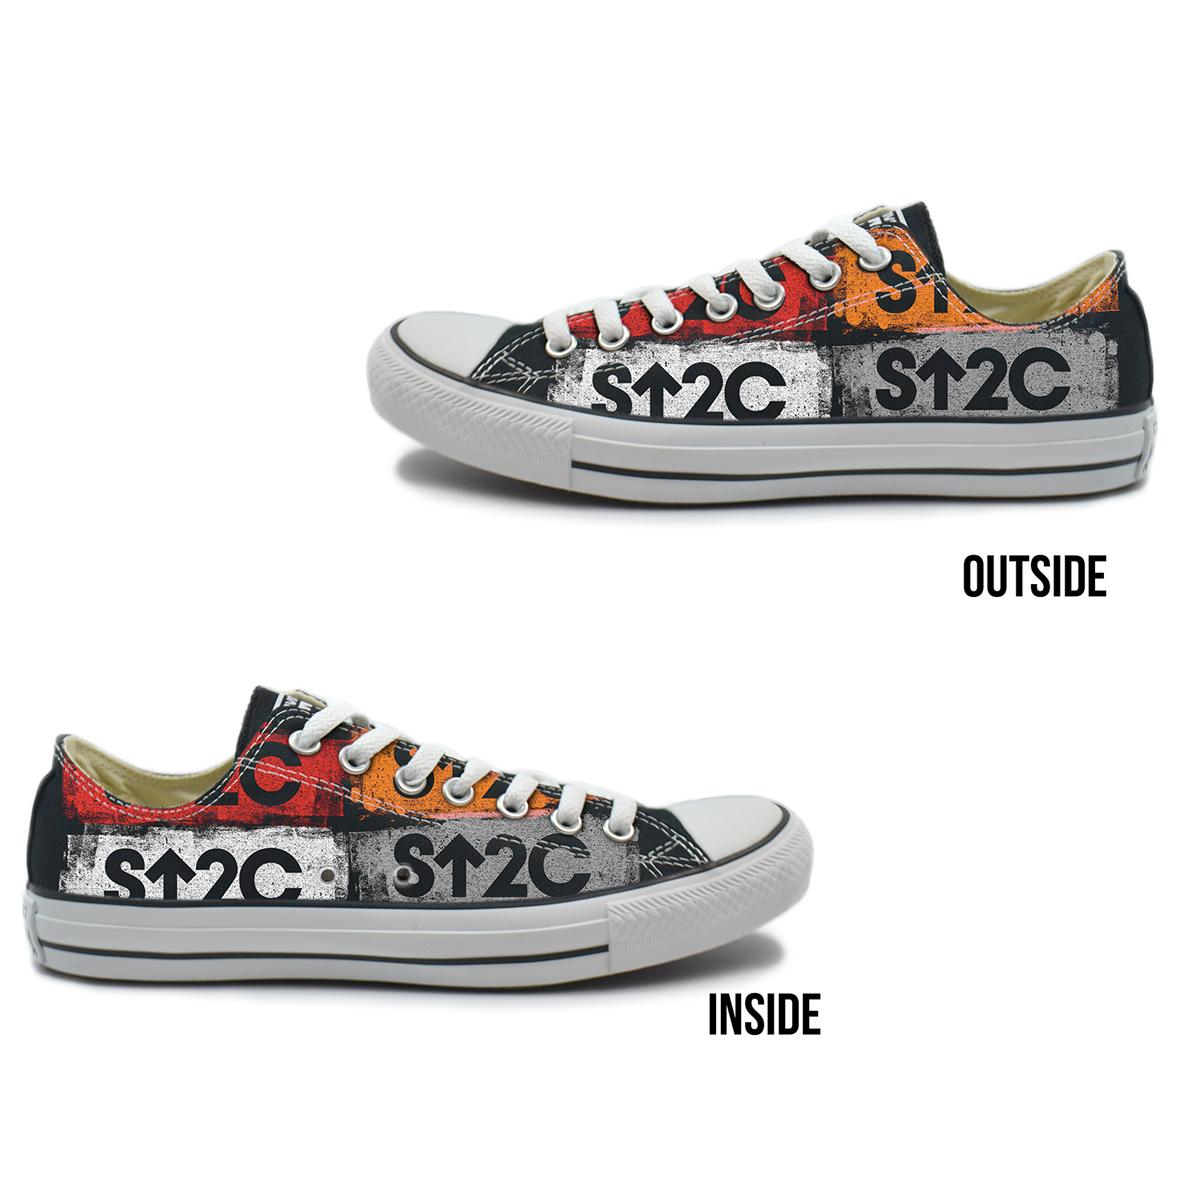 SU2C Possibility Converse All-Star Low Top